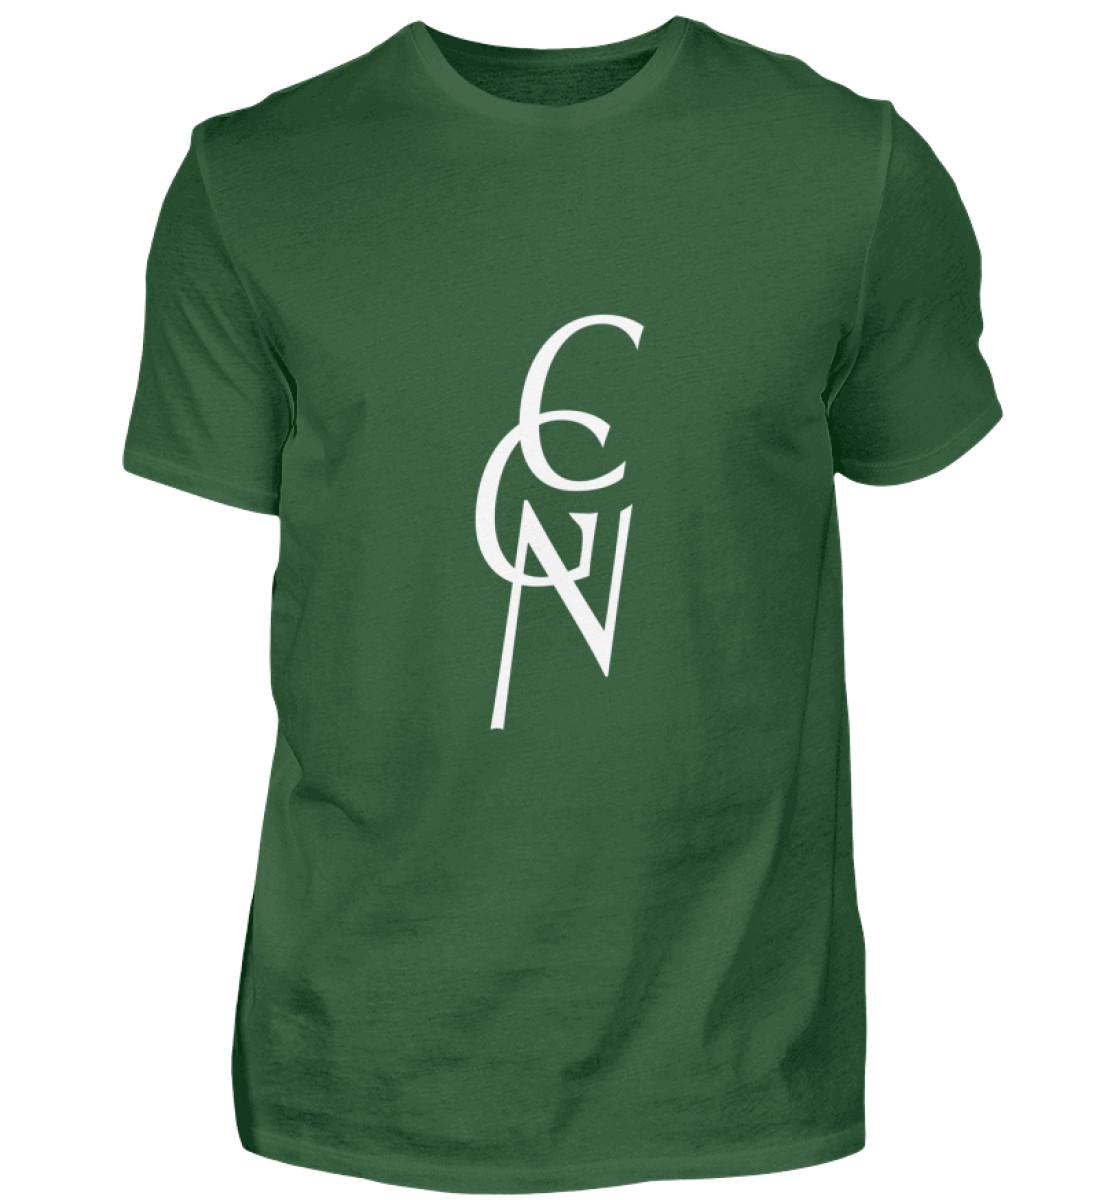 CGN - T-Shirt Herren - Herren Shirt-833